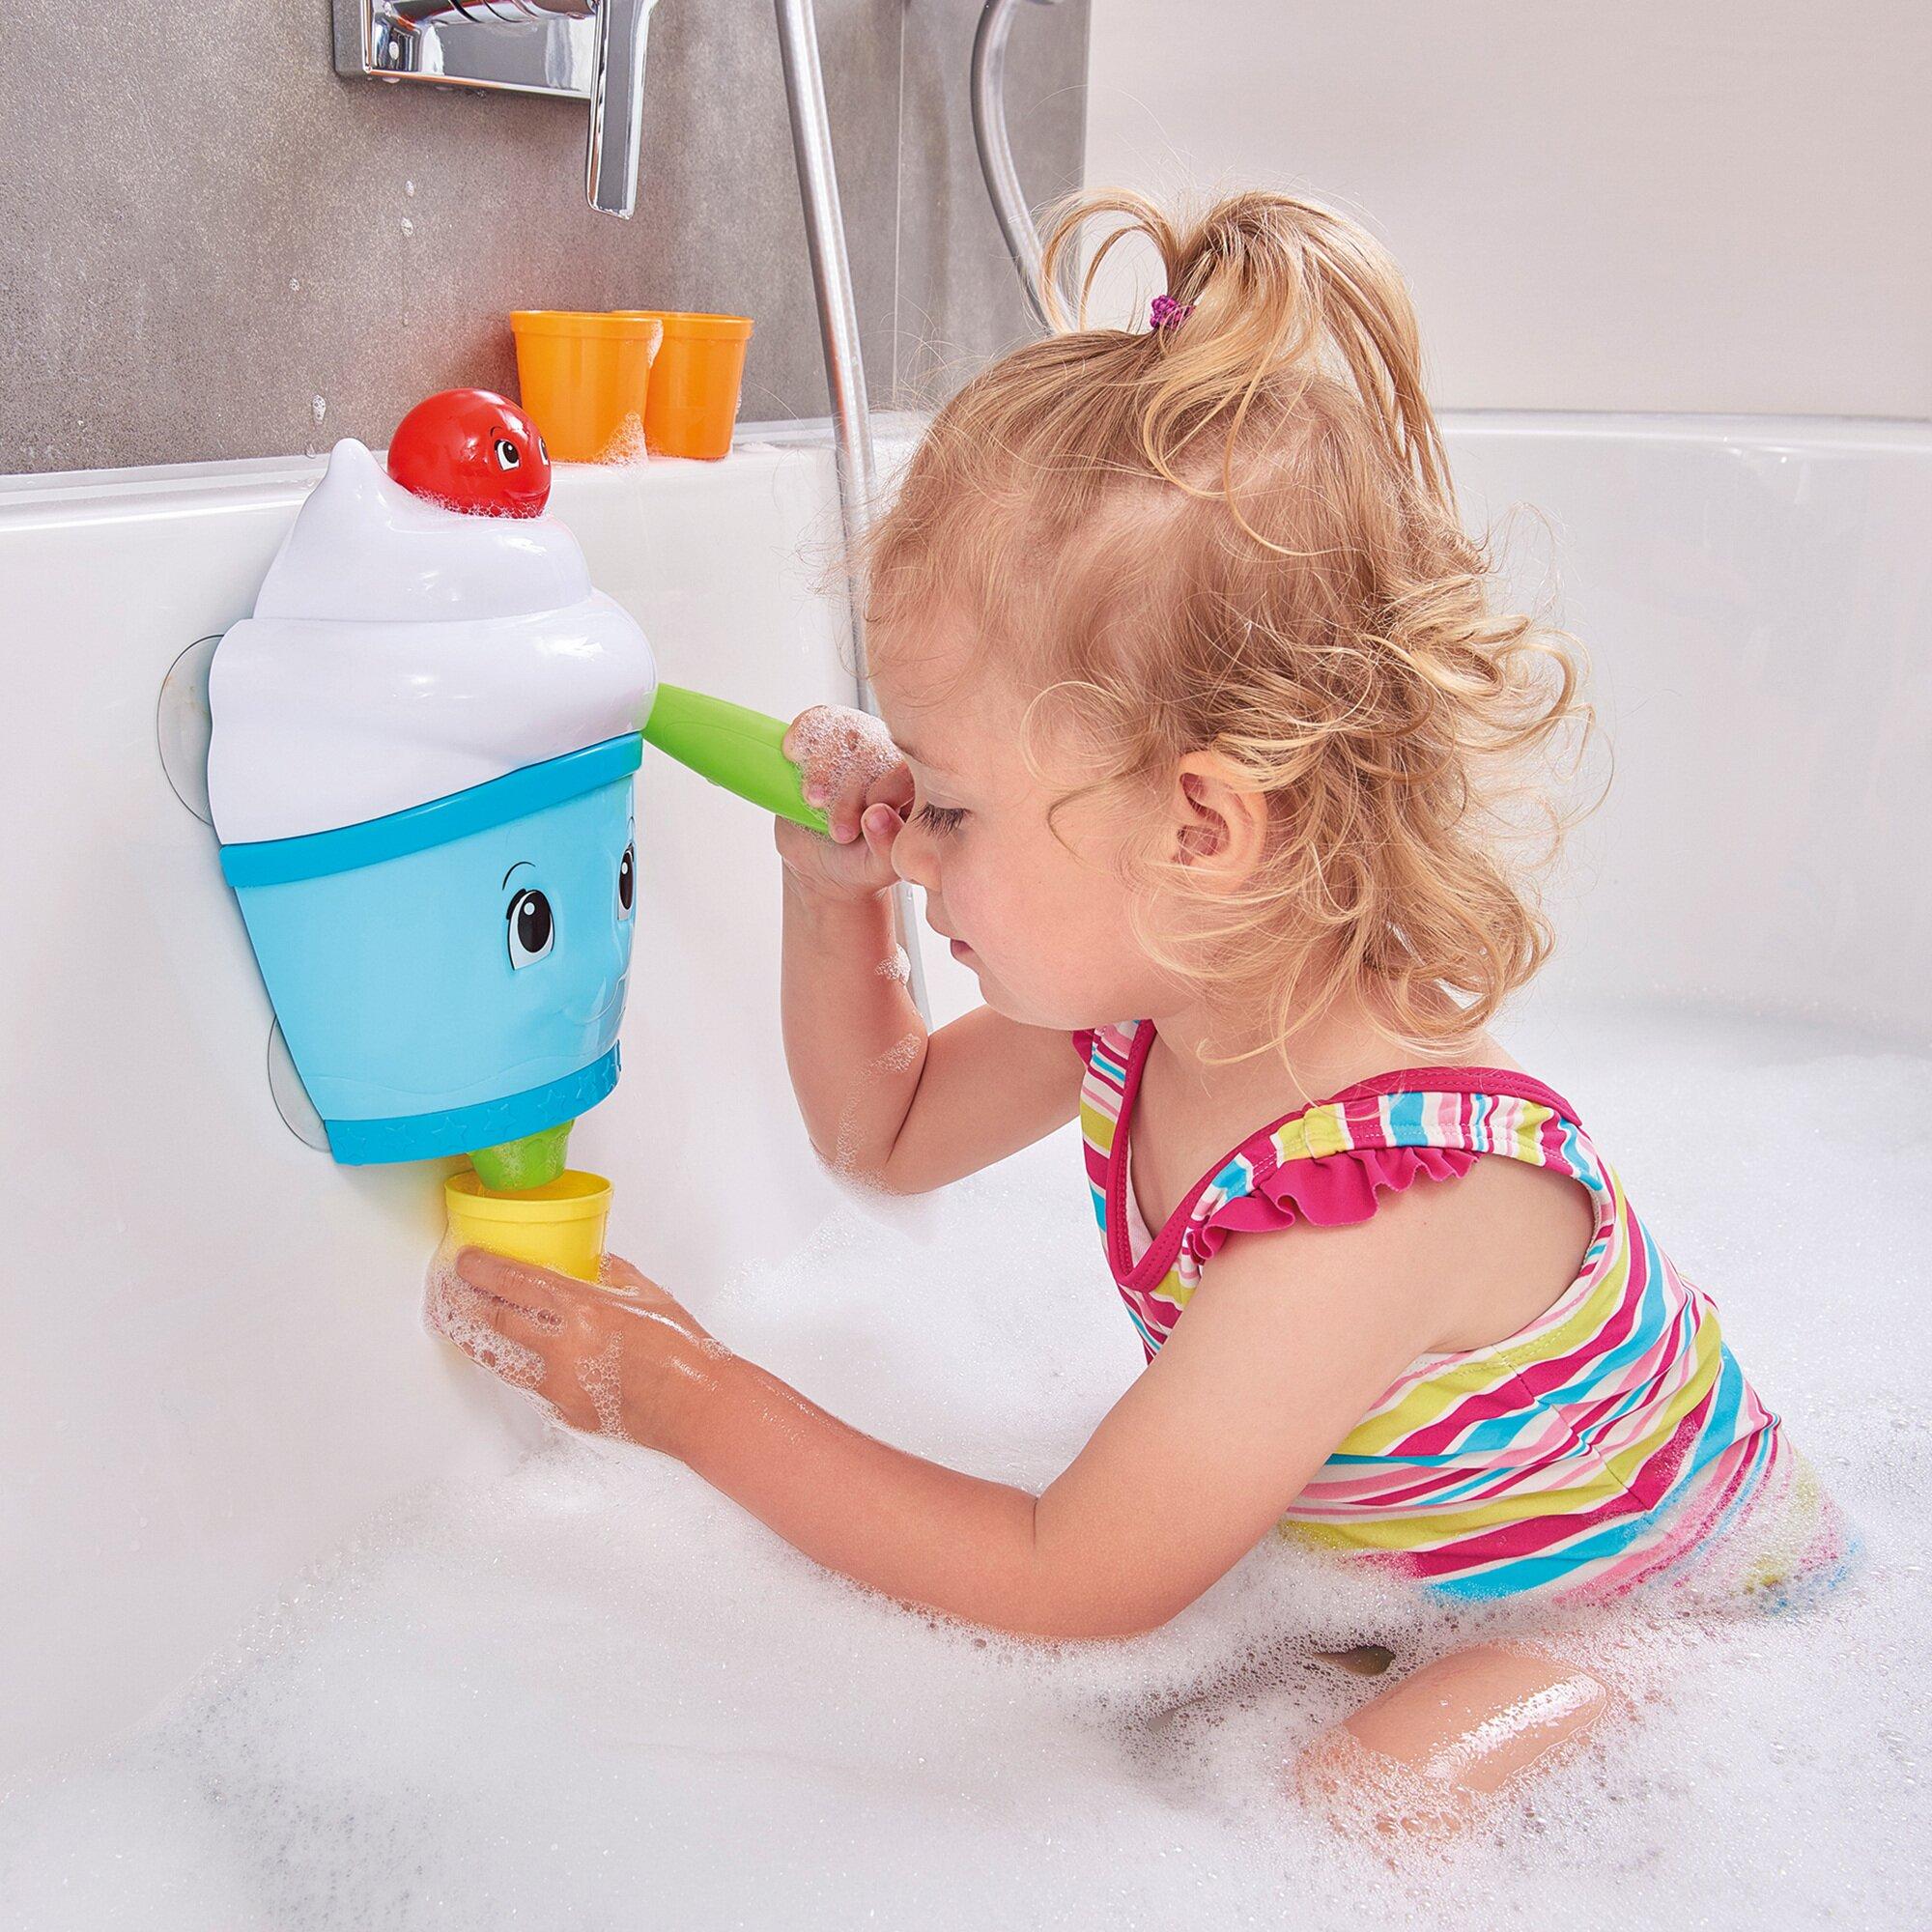 simba-badespielzeug-abc-schaummaschine